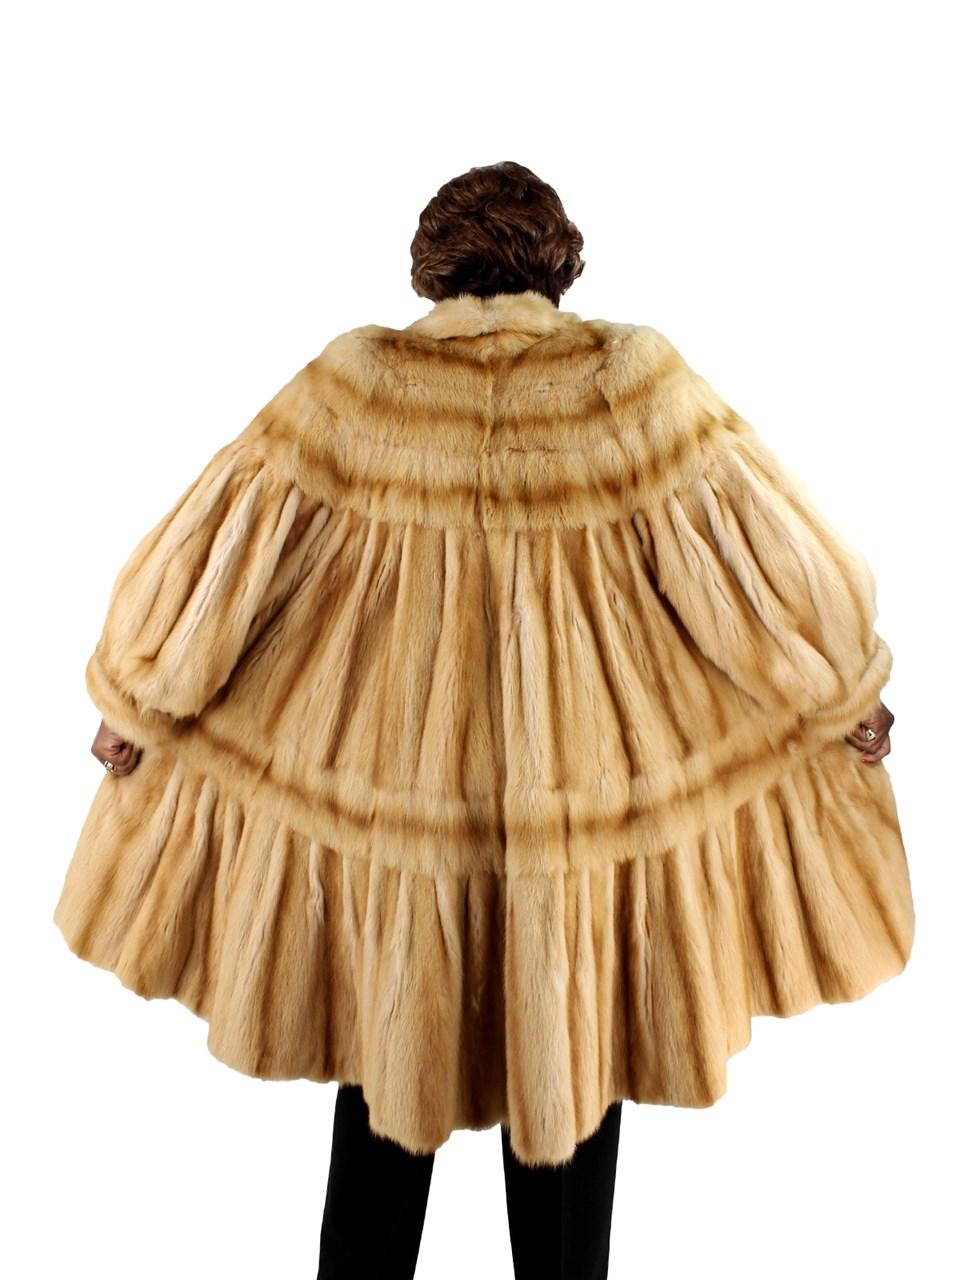 Teso Golden Kilinsky Coat Tiered Design